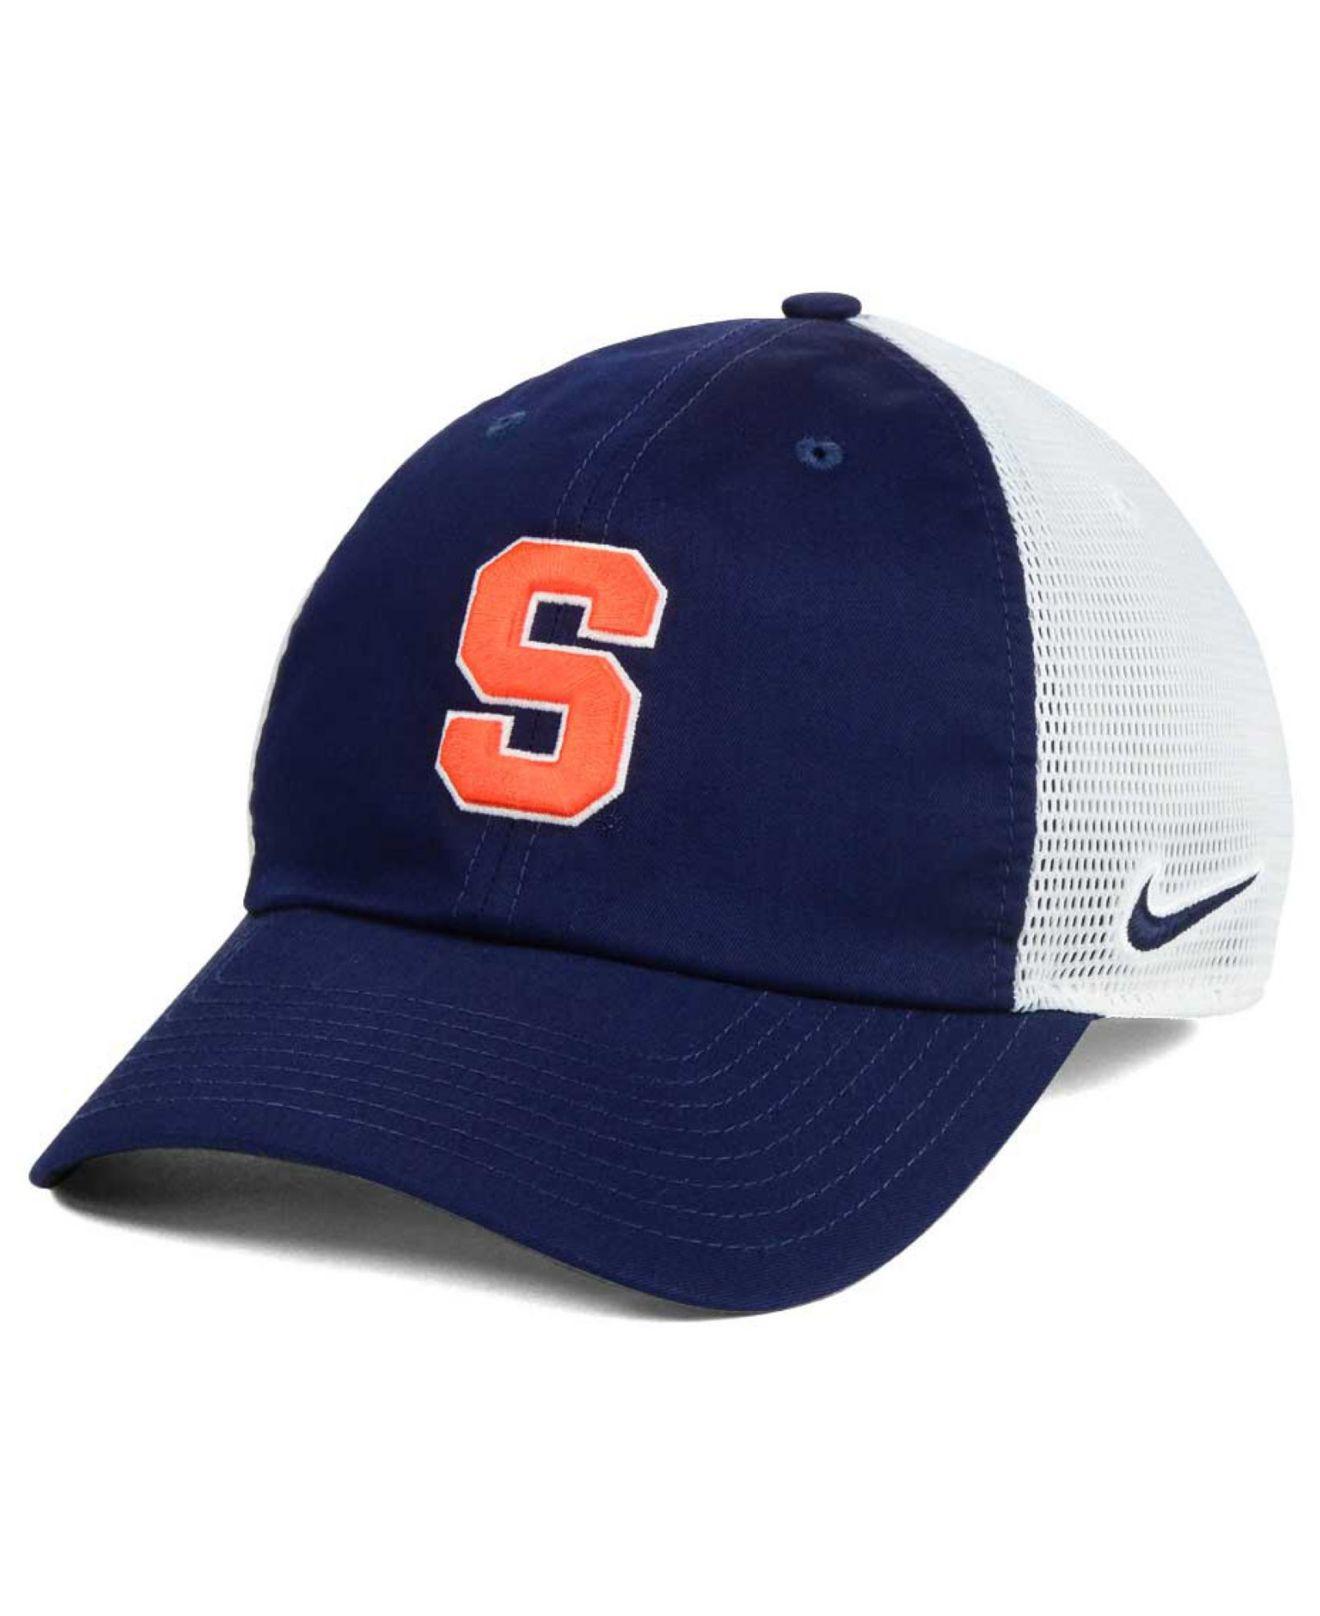 sale retailer b70e8 a7e27 Lyst - Nike Syracuse Orange H86 Trucker Cap in Blue for Men